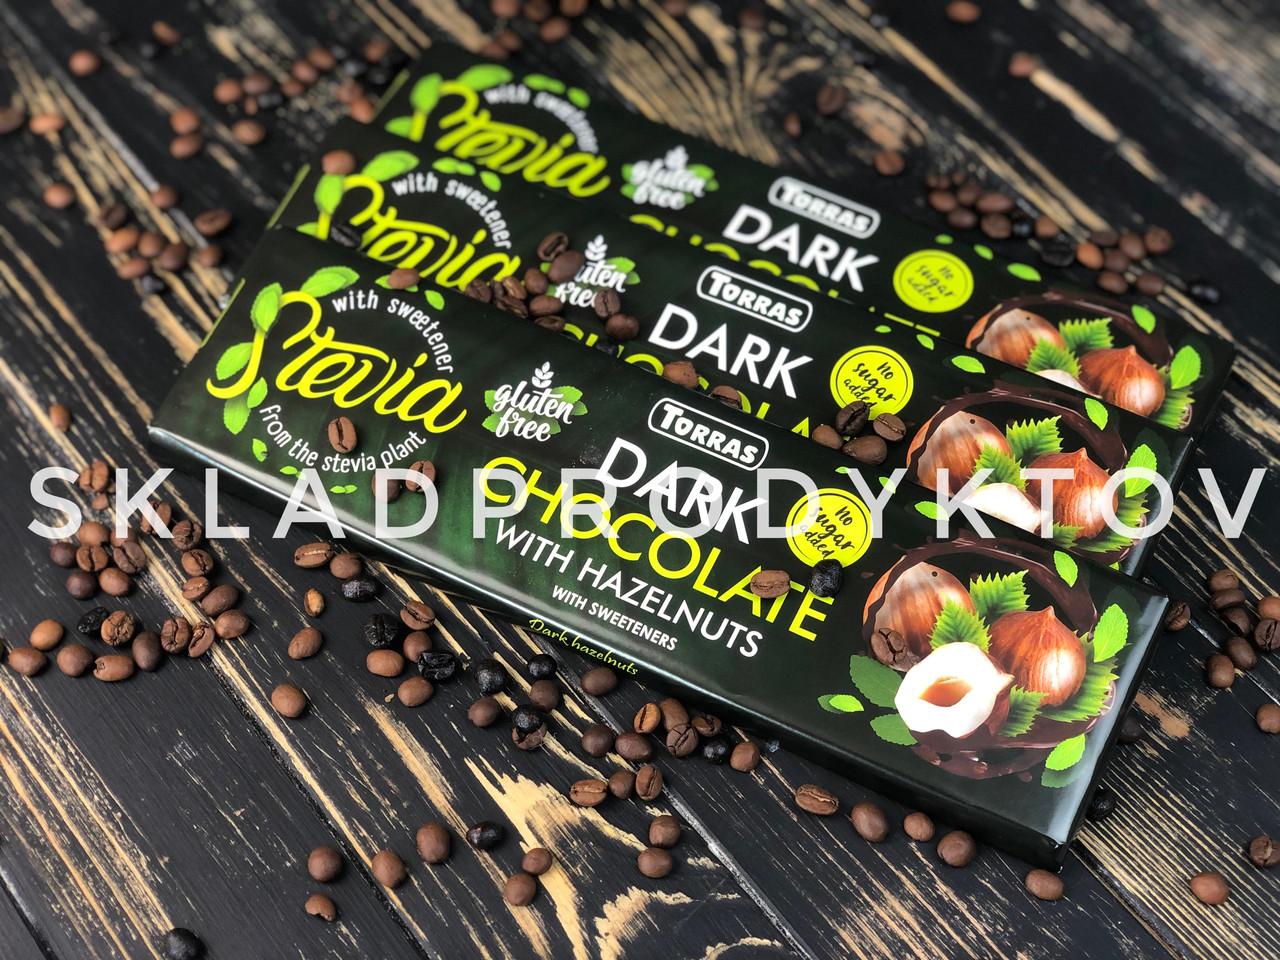 Шоколад черный с фундуком без сахара и глютена Torras Dark Chocolate whis Hazelnuts 300г (Испания)